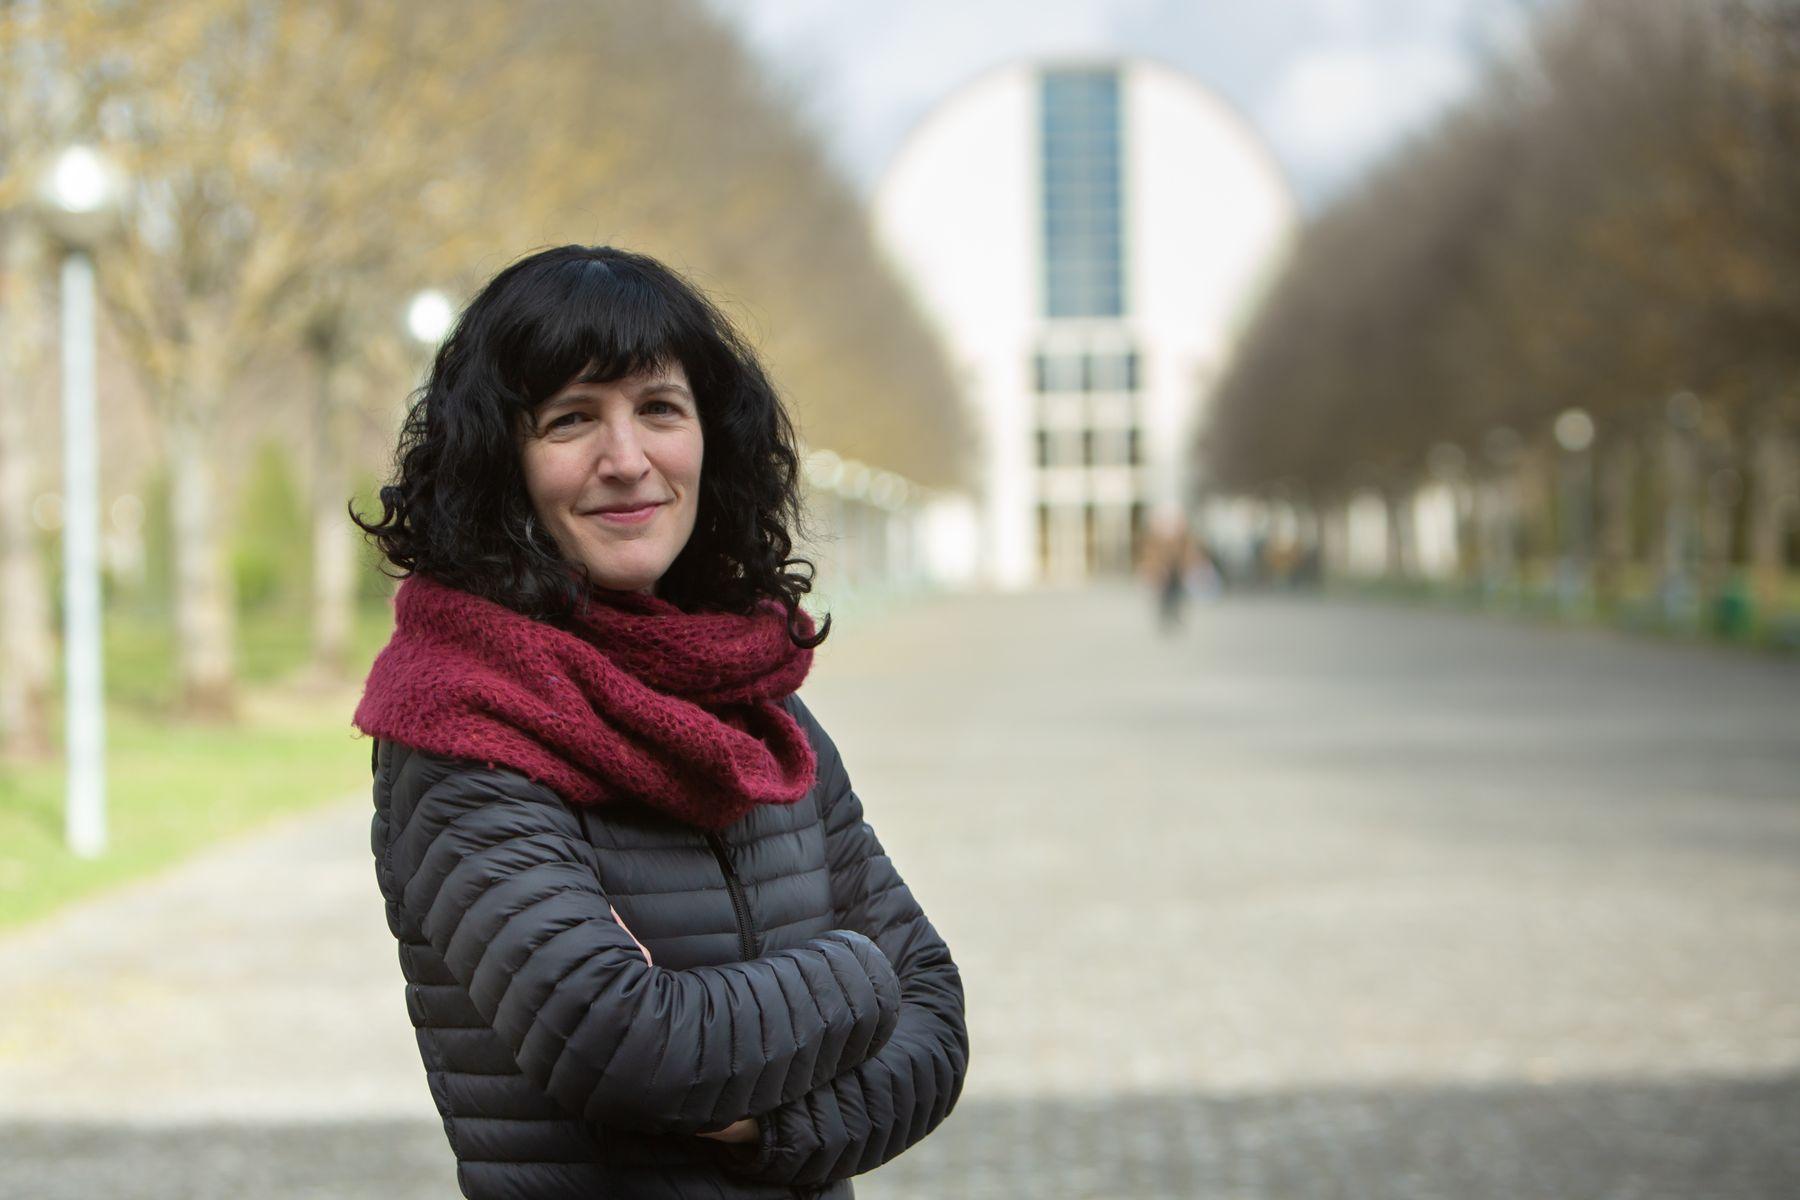 La bióloga Maite Martínez Aldaya, investigadora del Instituto IS-FOOD de la UPNA, en el campus de Arrosadia en Pamplona